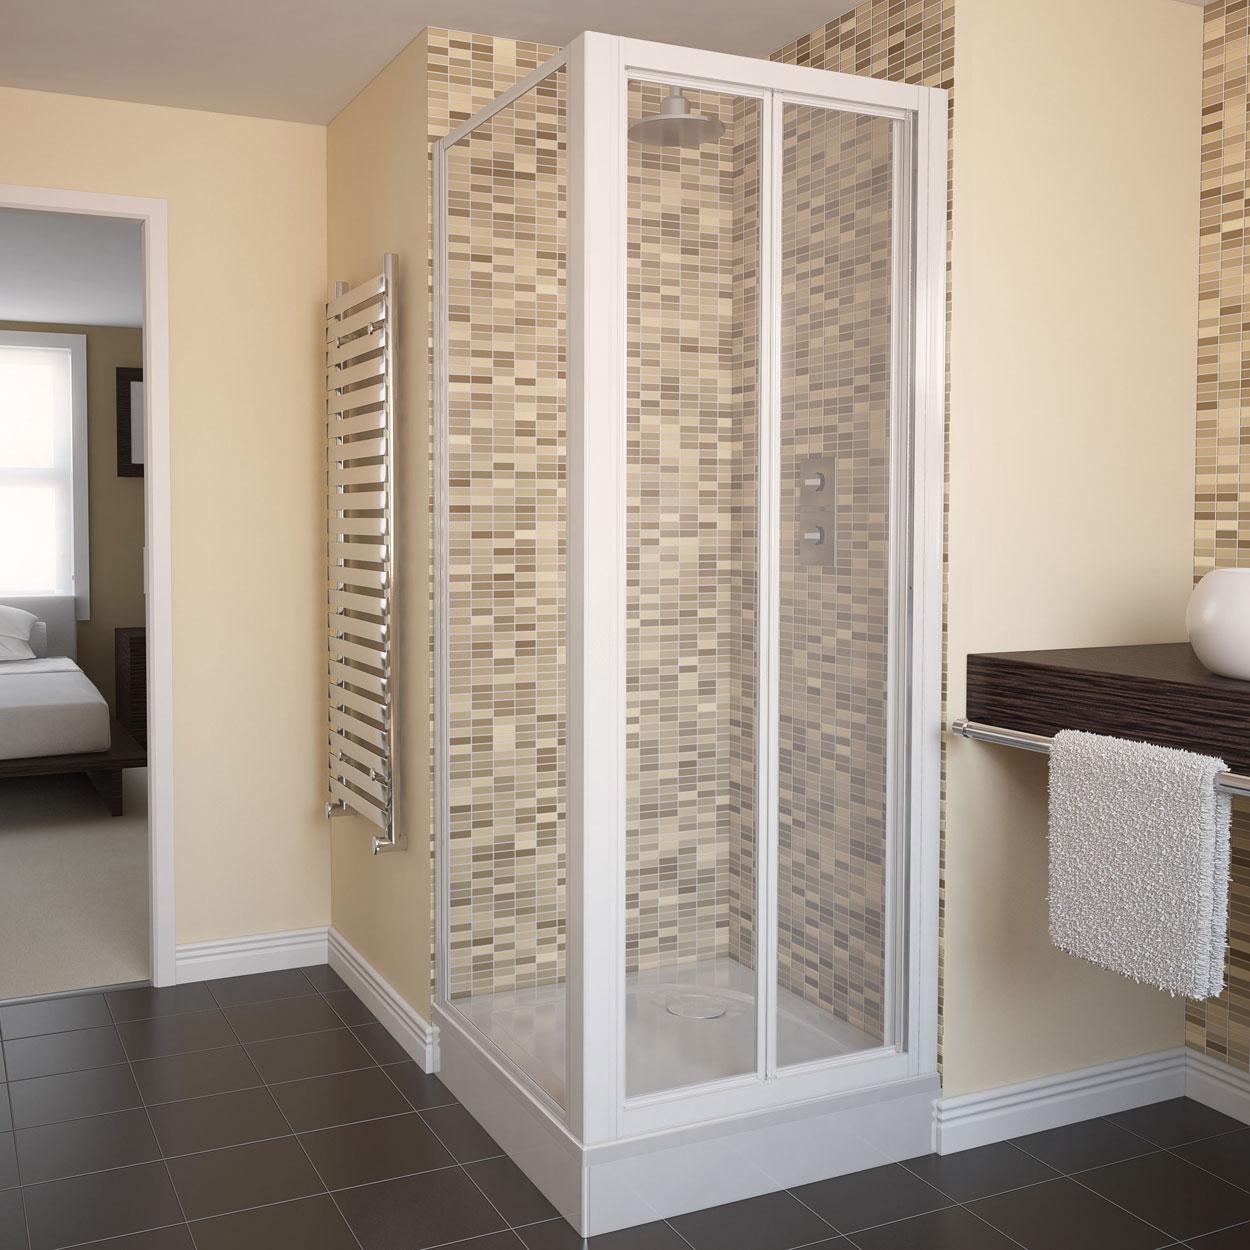 Aluminium windows, doors and showers.